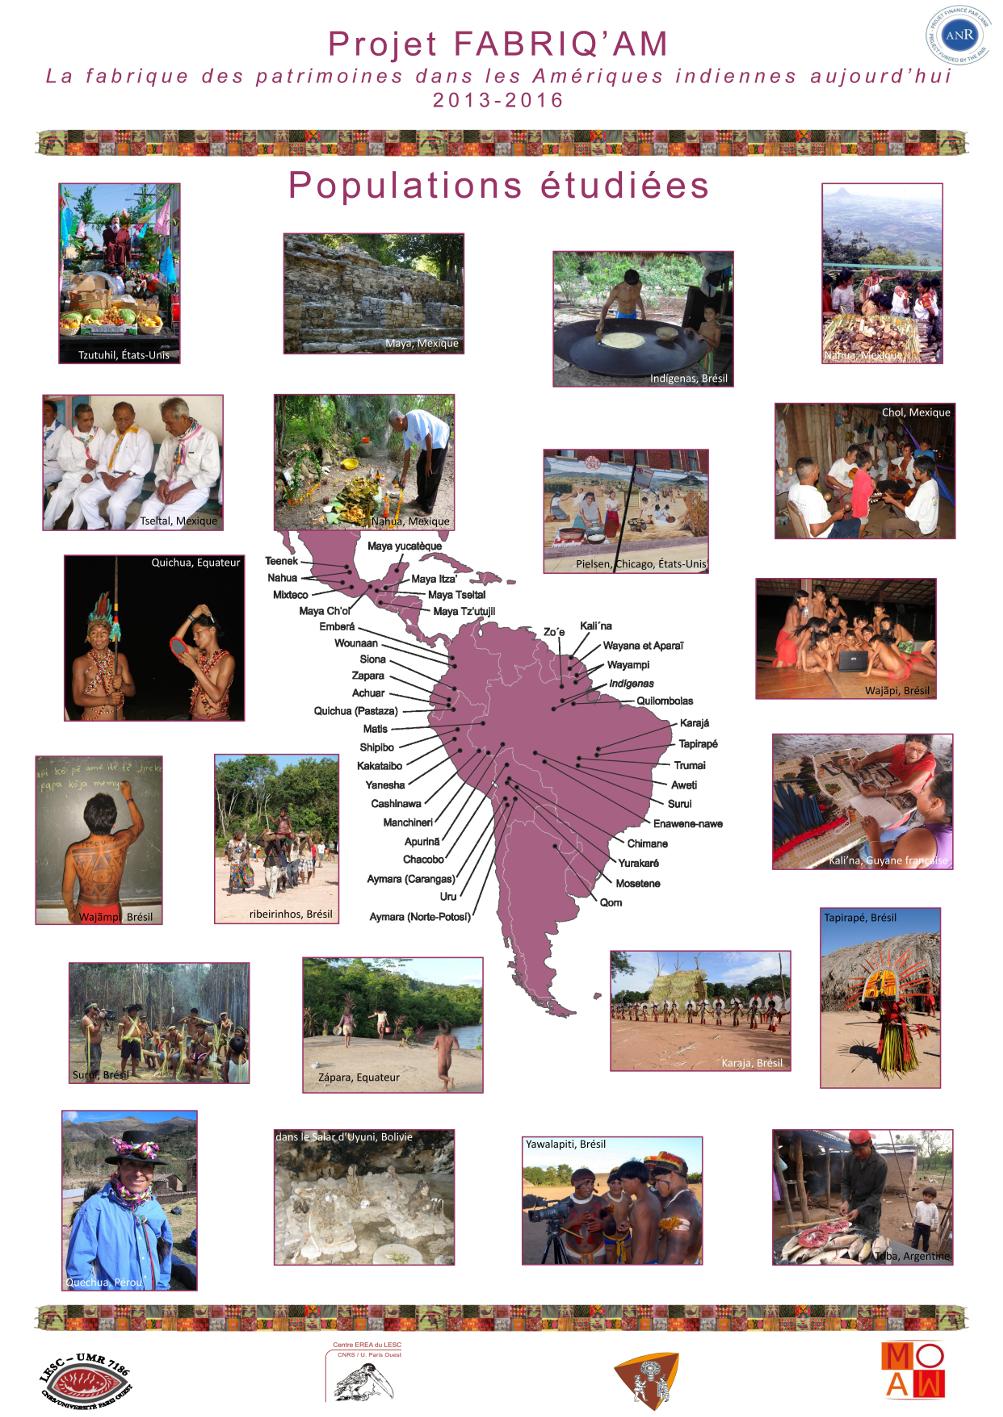 poster-1-populations-etudiees